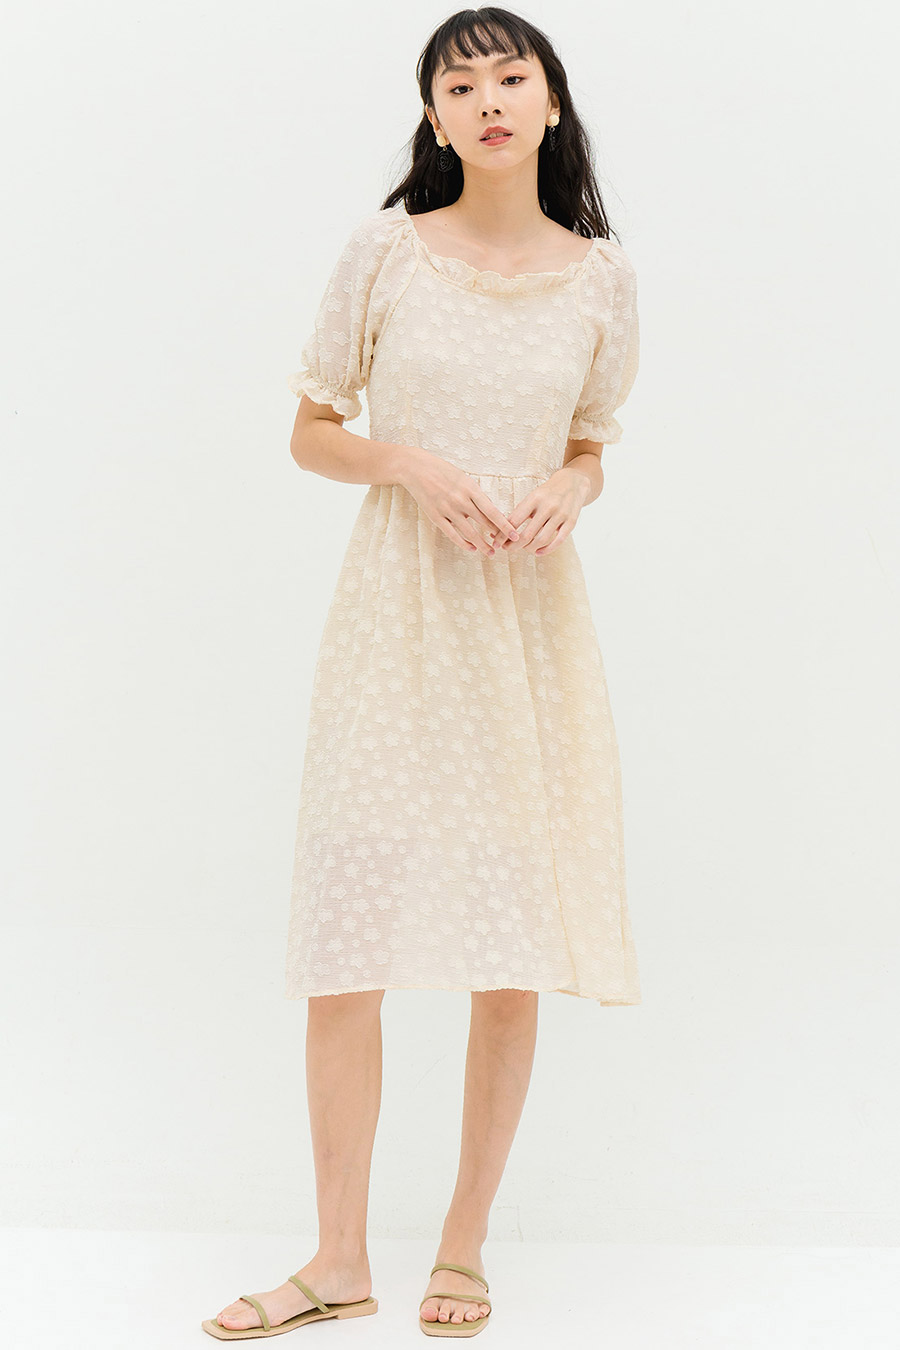 PENELOPE DRESS - VANILLA